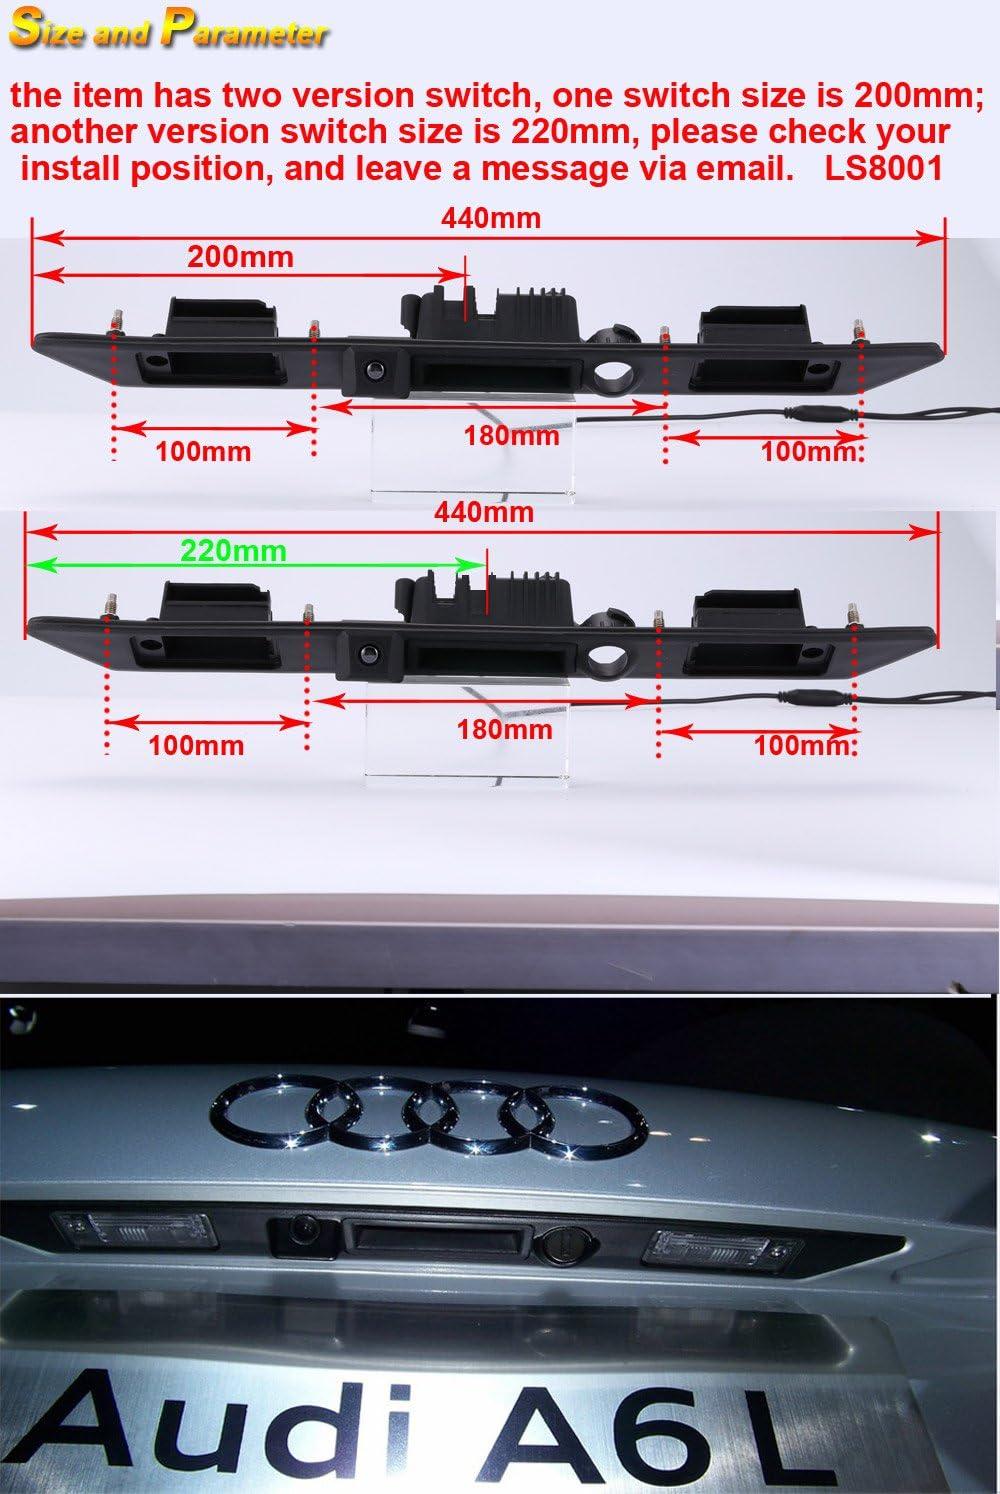 Rückfahrkamera für Audi A4 Cabrio 8H7 B6 Limo B7 S4 8E 8H S6 A6 A6L C7 4G A5 8T